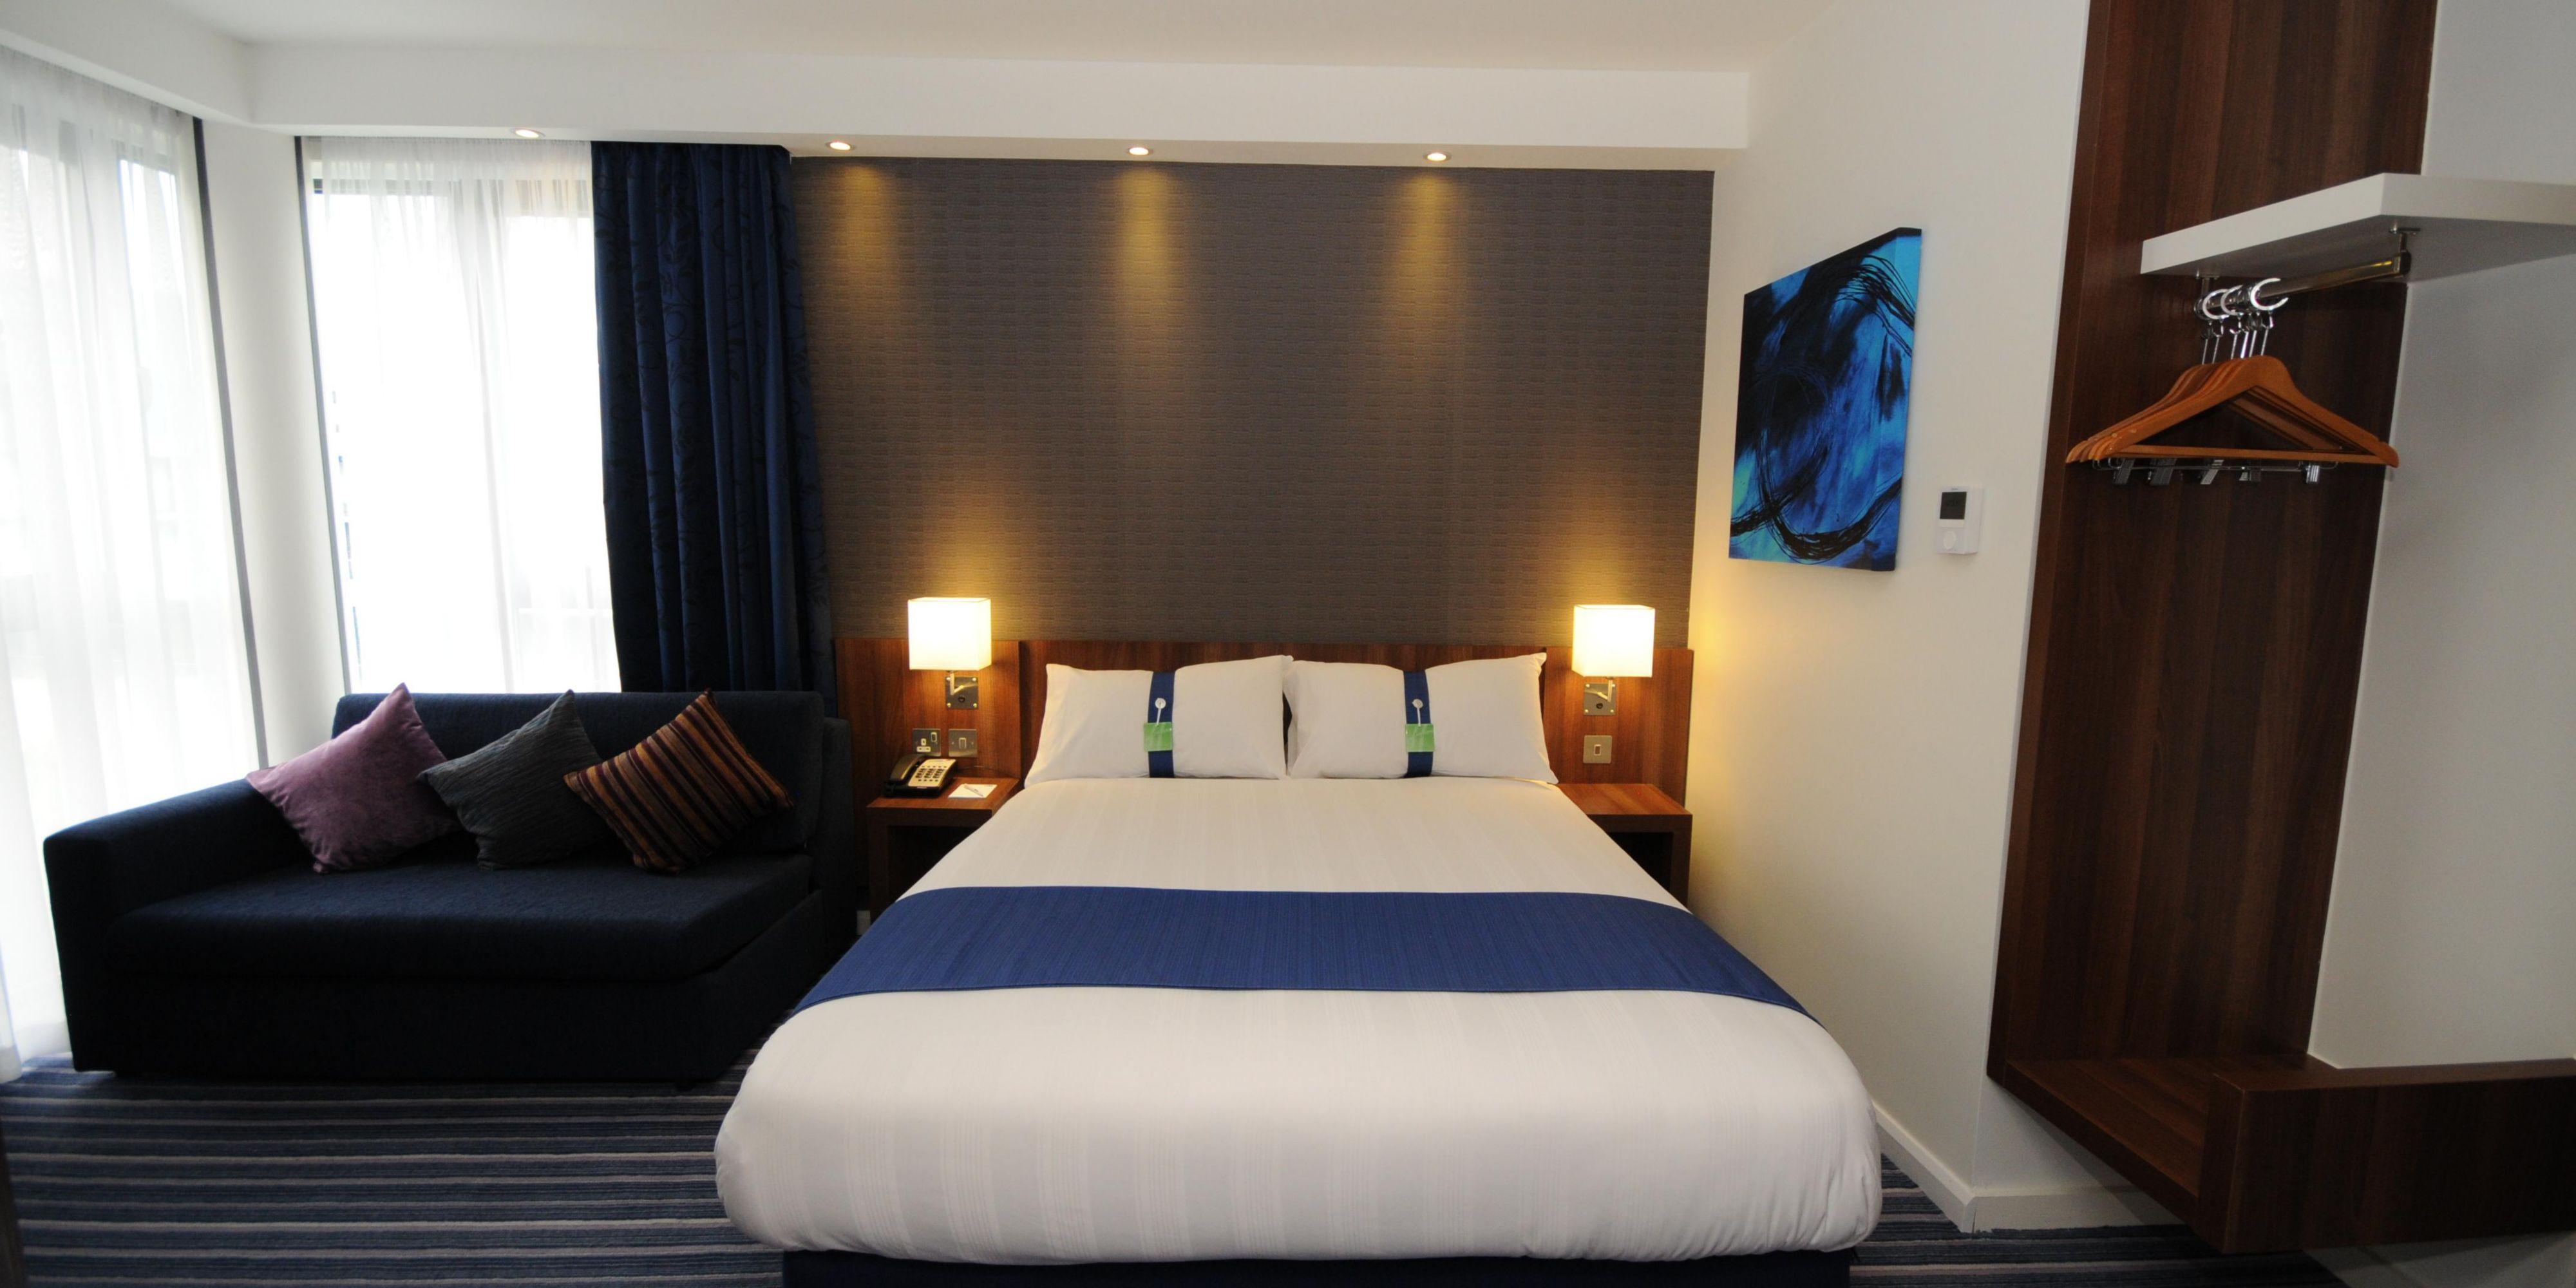 Holiday Inn Express Sheffield 3651760050 2x1